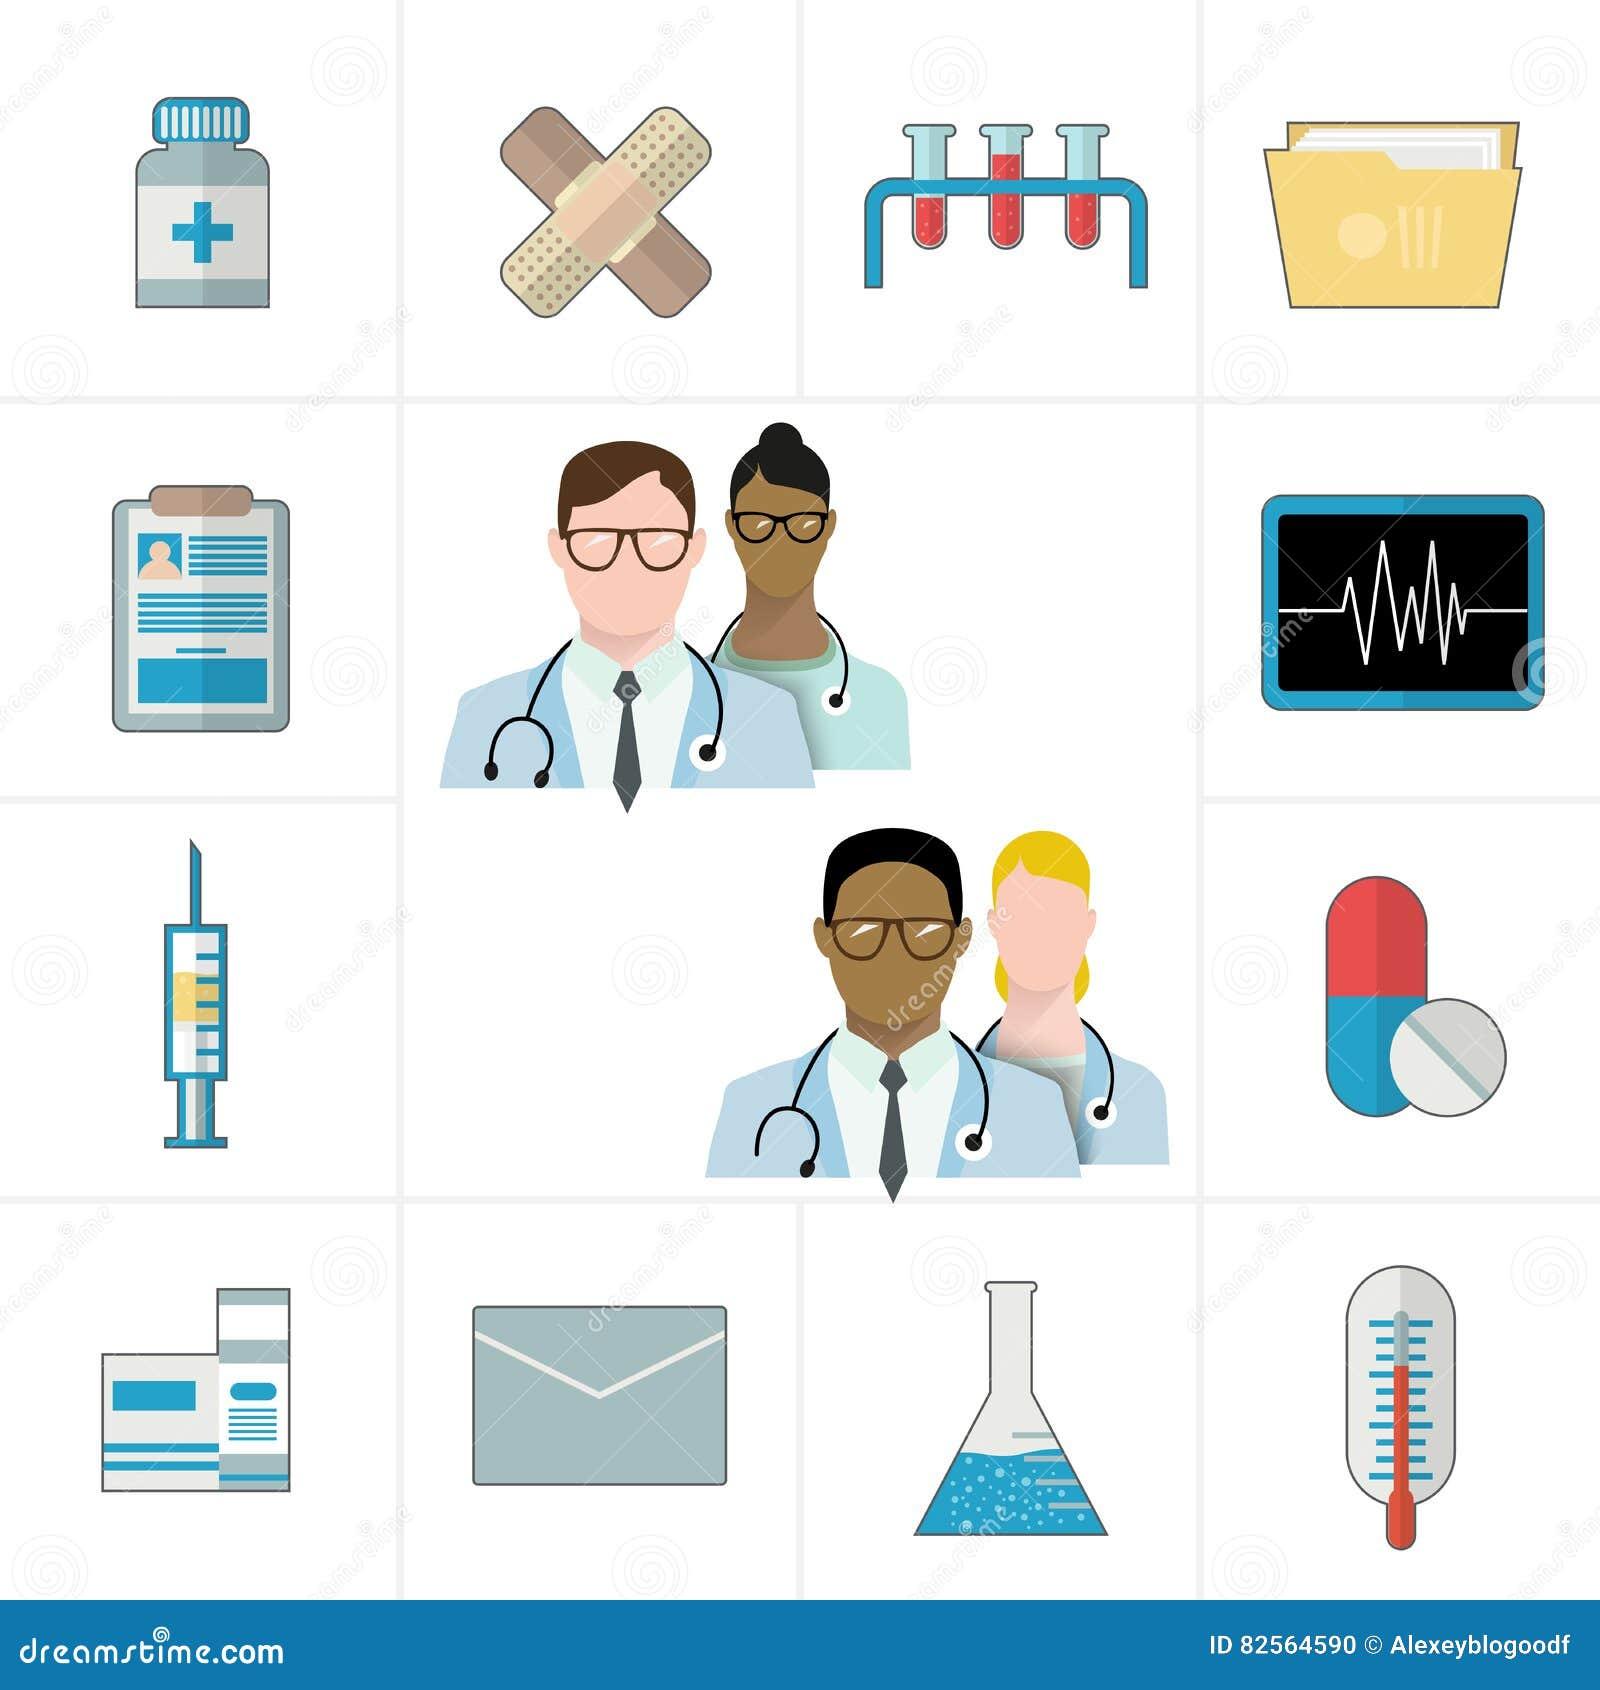 Значки медицинских и фармацевтических или pharma Термометр, таблетки и пилюльки, лекарство, cardiogram, шприц, папка и документы